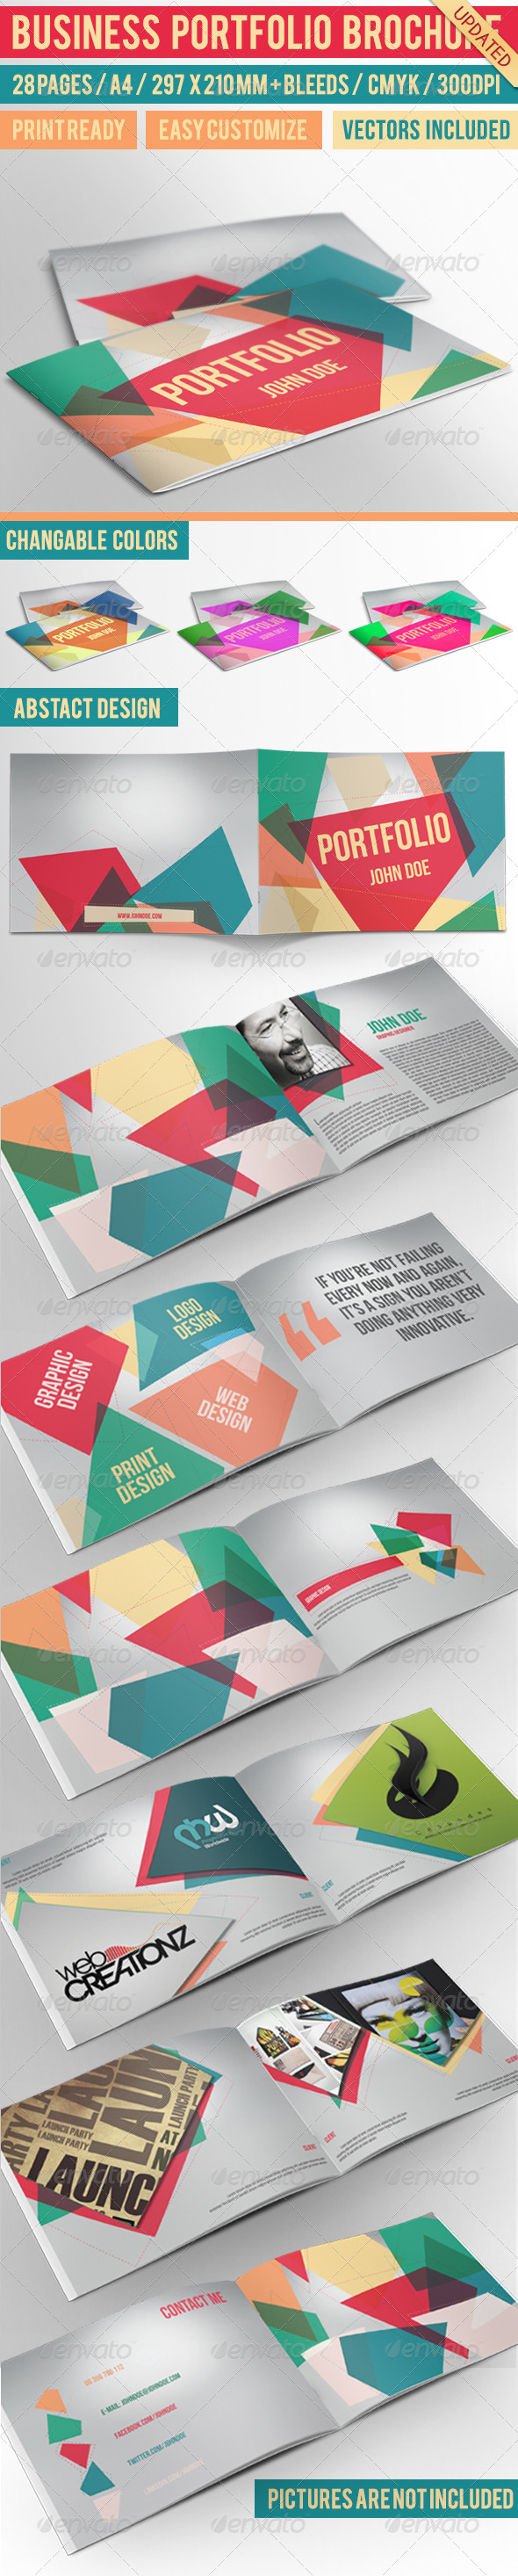 Business Portfolio Brochure